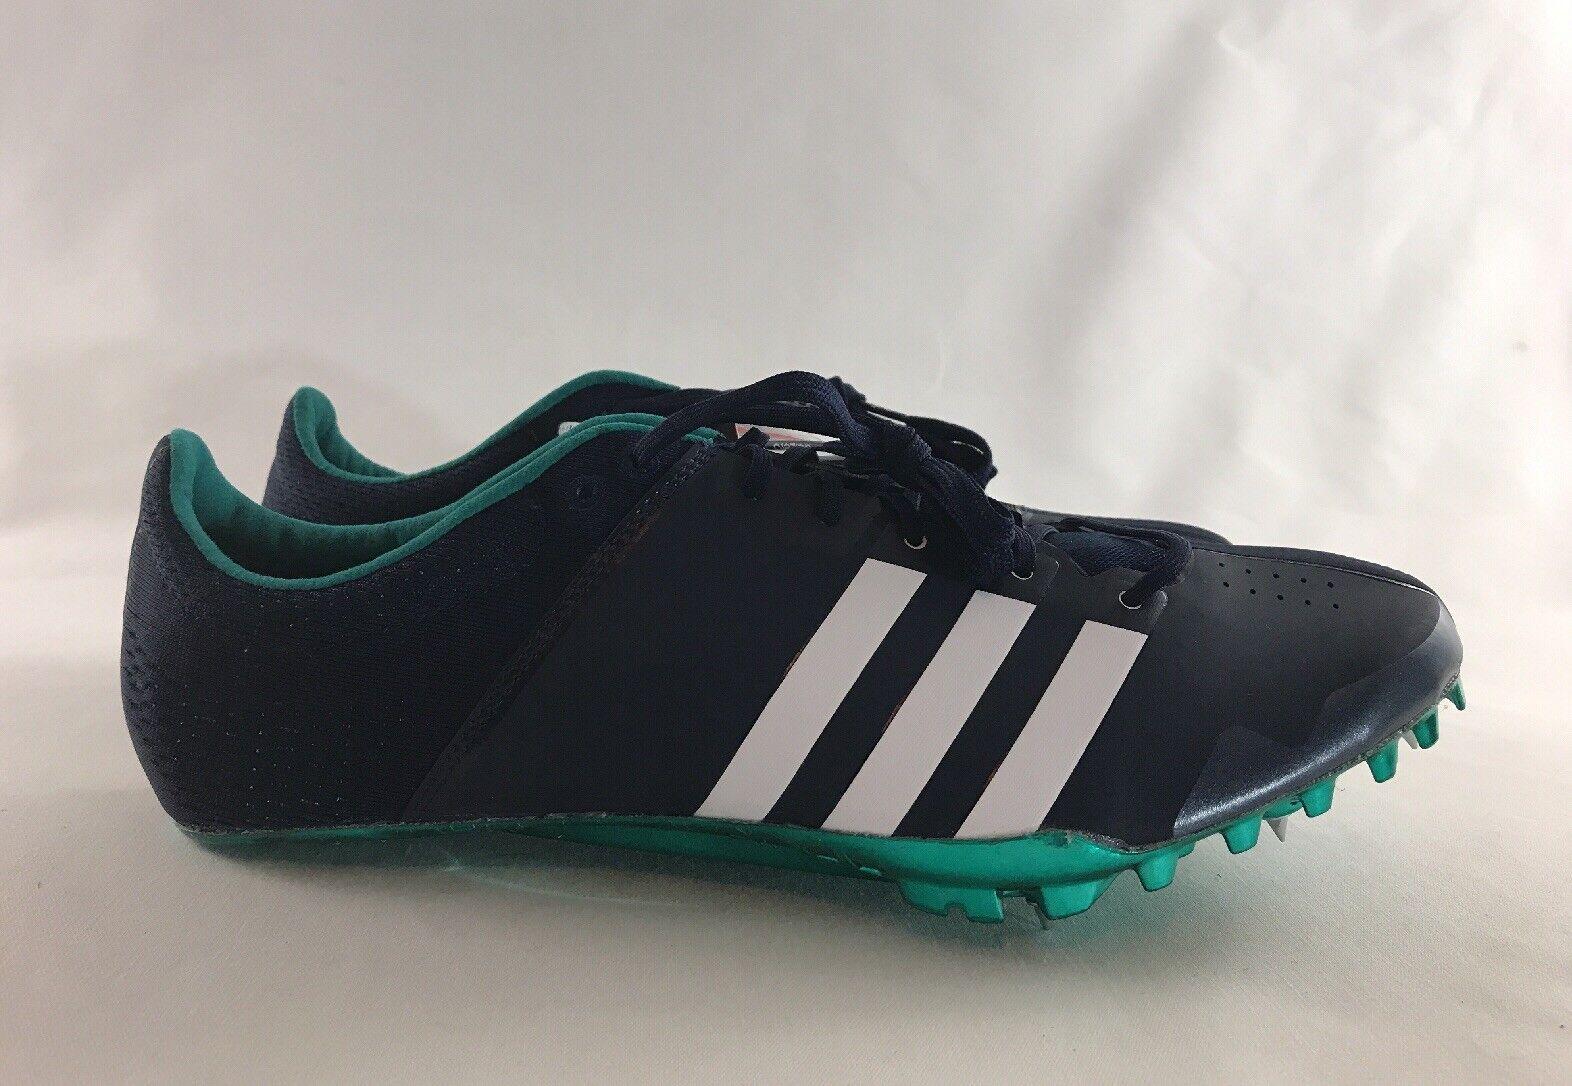 ADIDAS Adizero Green Navy Running Sprinter Track Cleats shoes AF5647 Men's 11.5